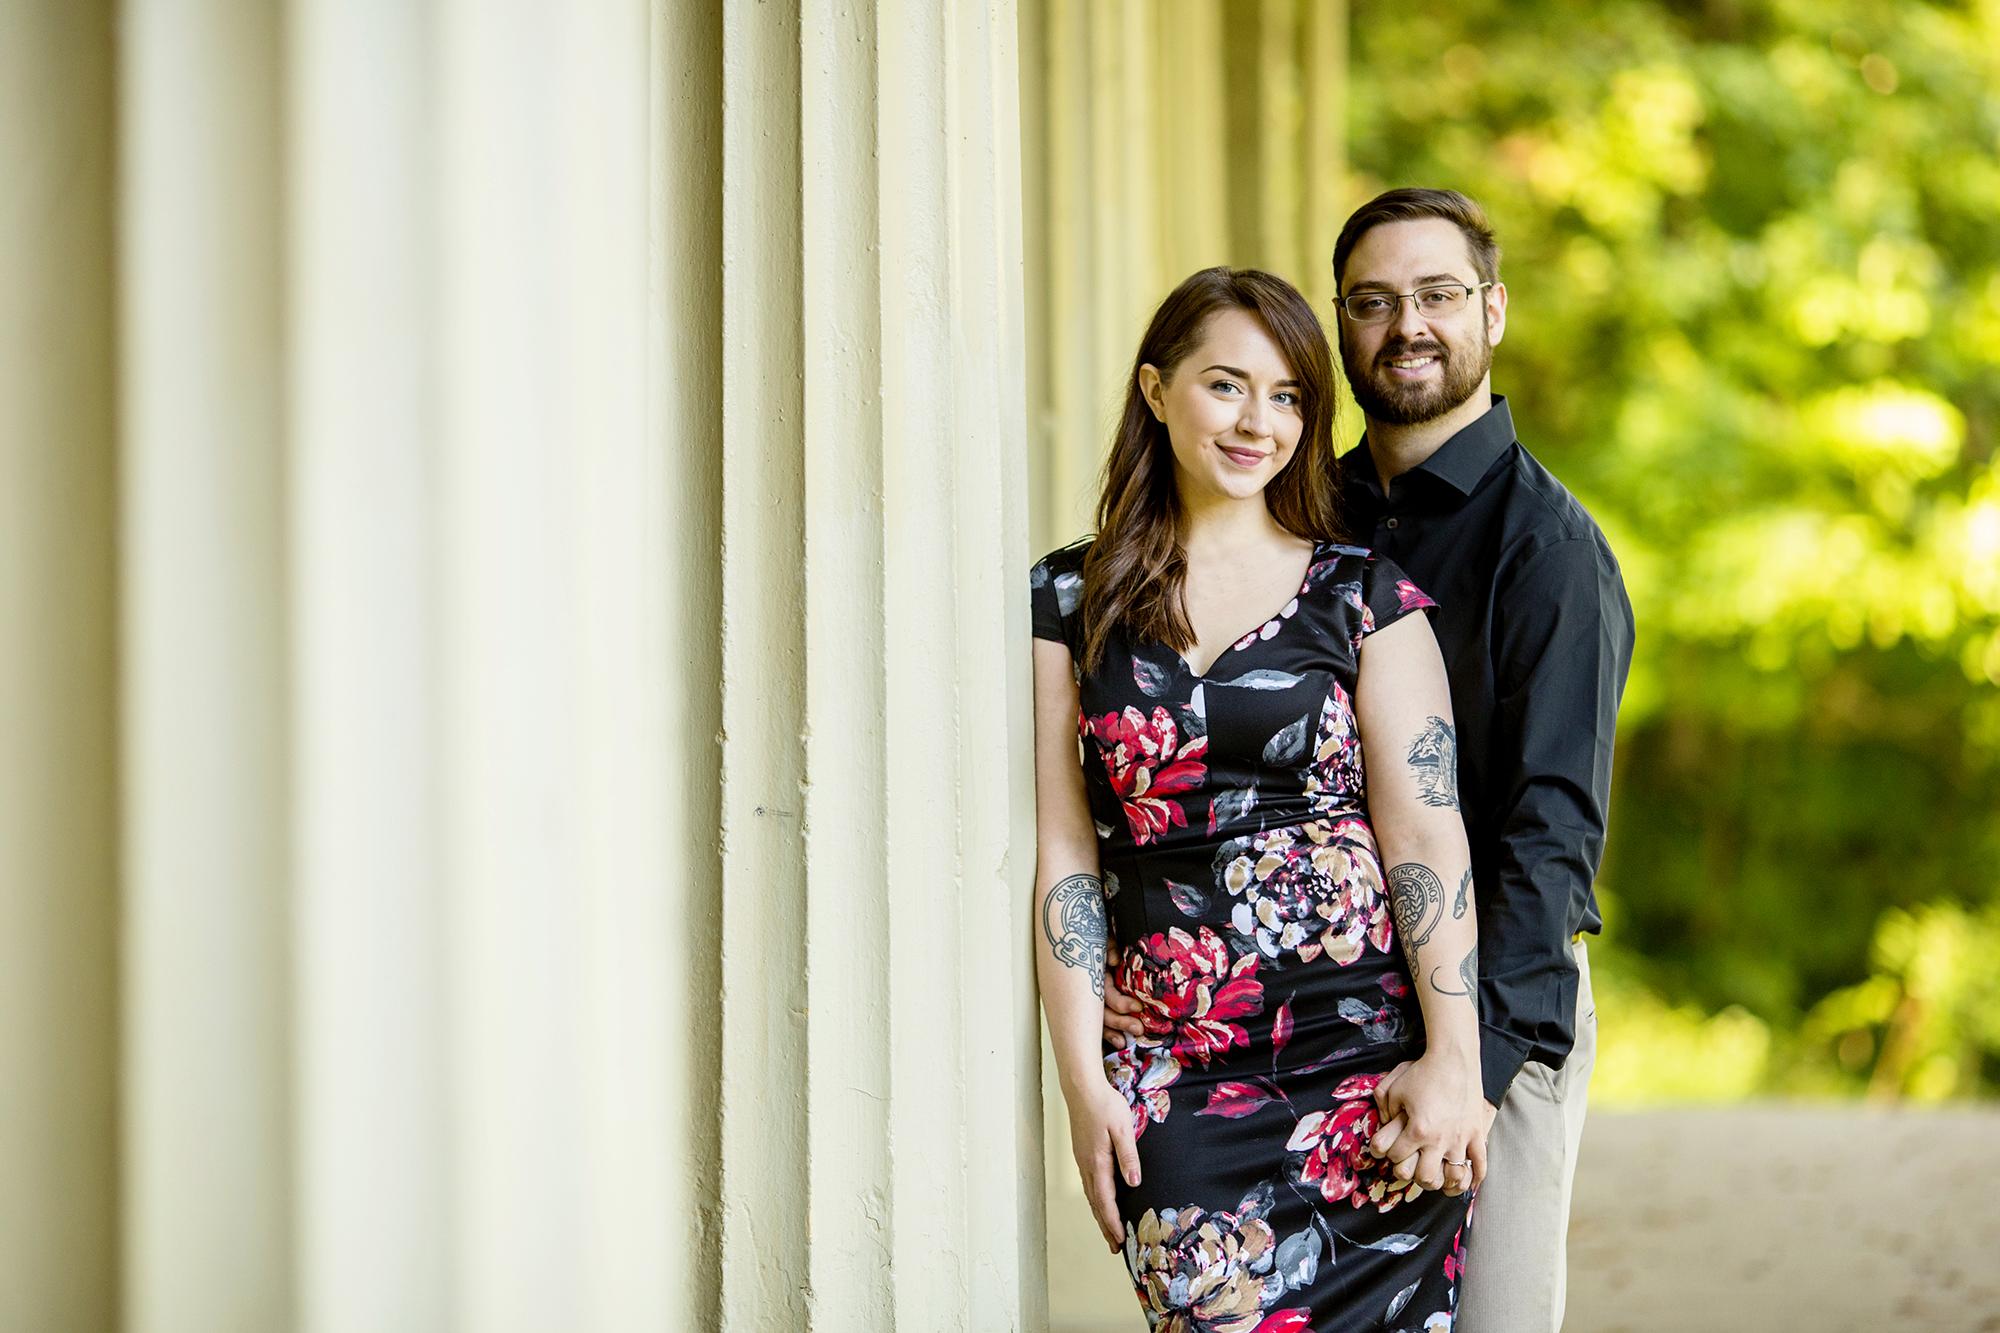 Seriously_Sabrina_Photography_Louisville_Kentucky_Engagement_Falls_of_Ohio_Seneca_Park_KarlMarlie61.jpg